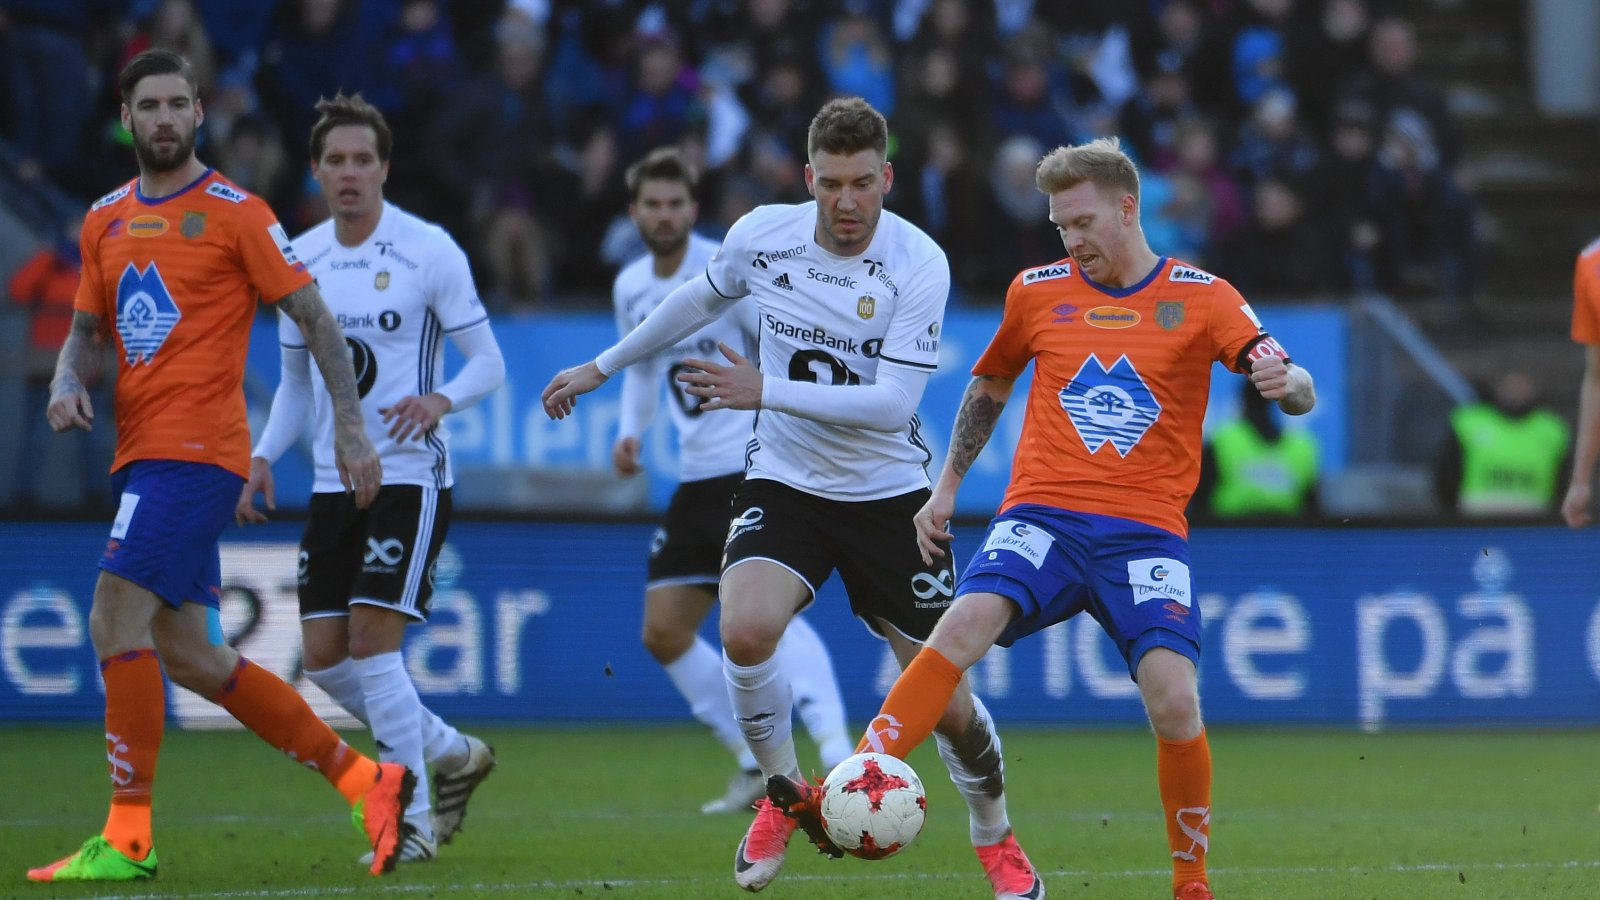 Nicklas Bendtner mot Aalesund